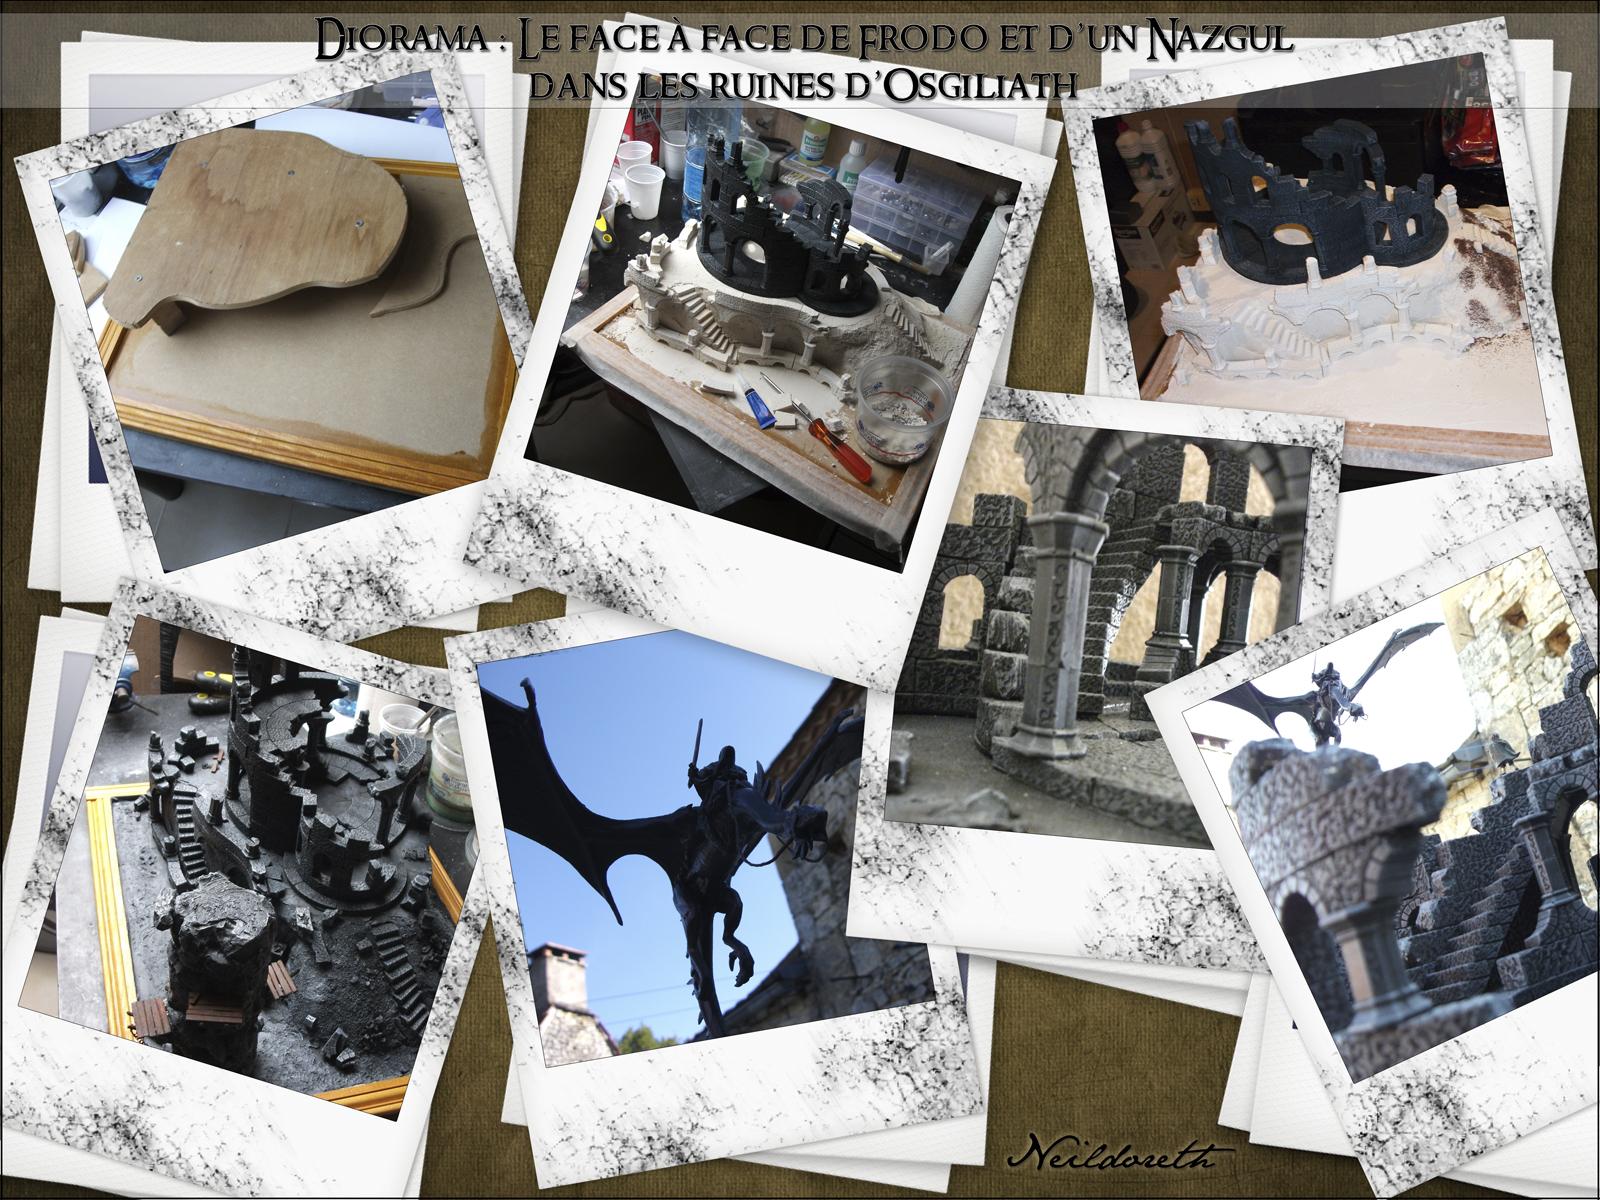 Neildoreth_diorama_pelemele